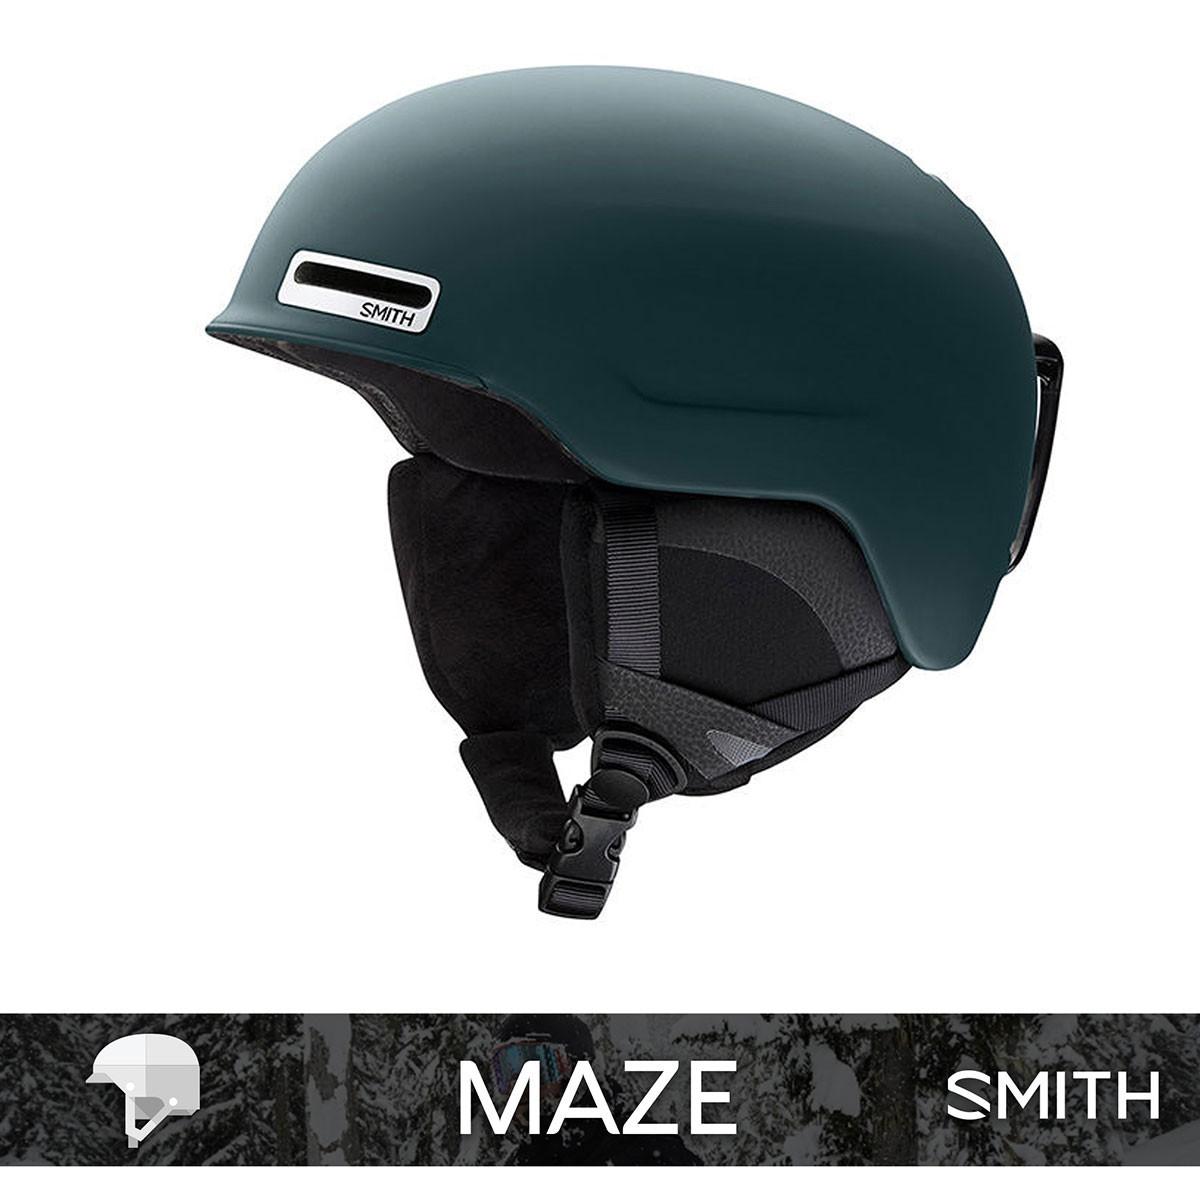 SMITH MAZE matte Deepforest - Изображение - AQUAMATRIX